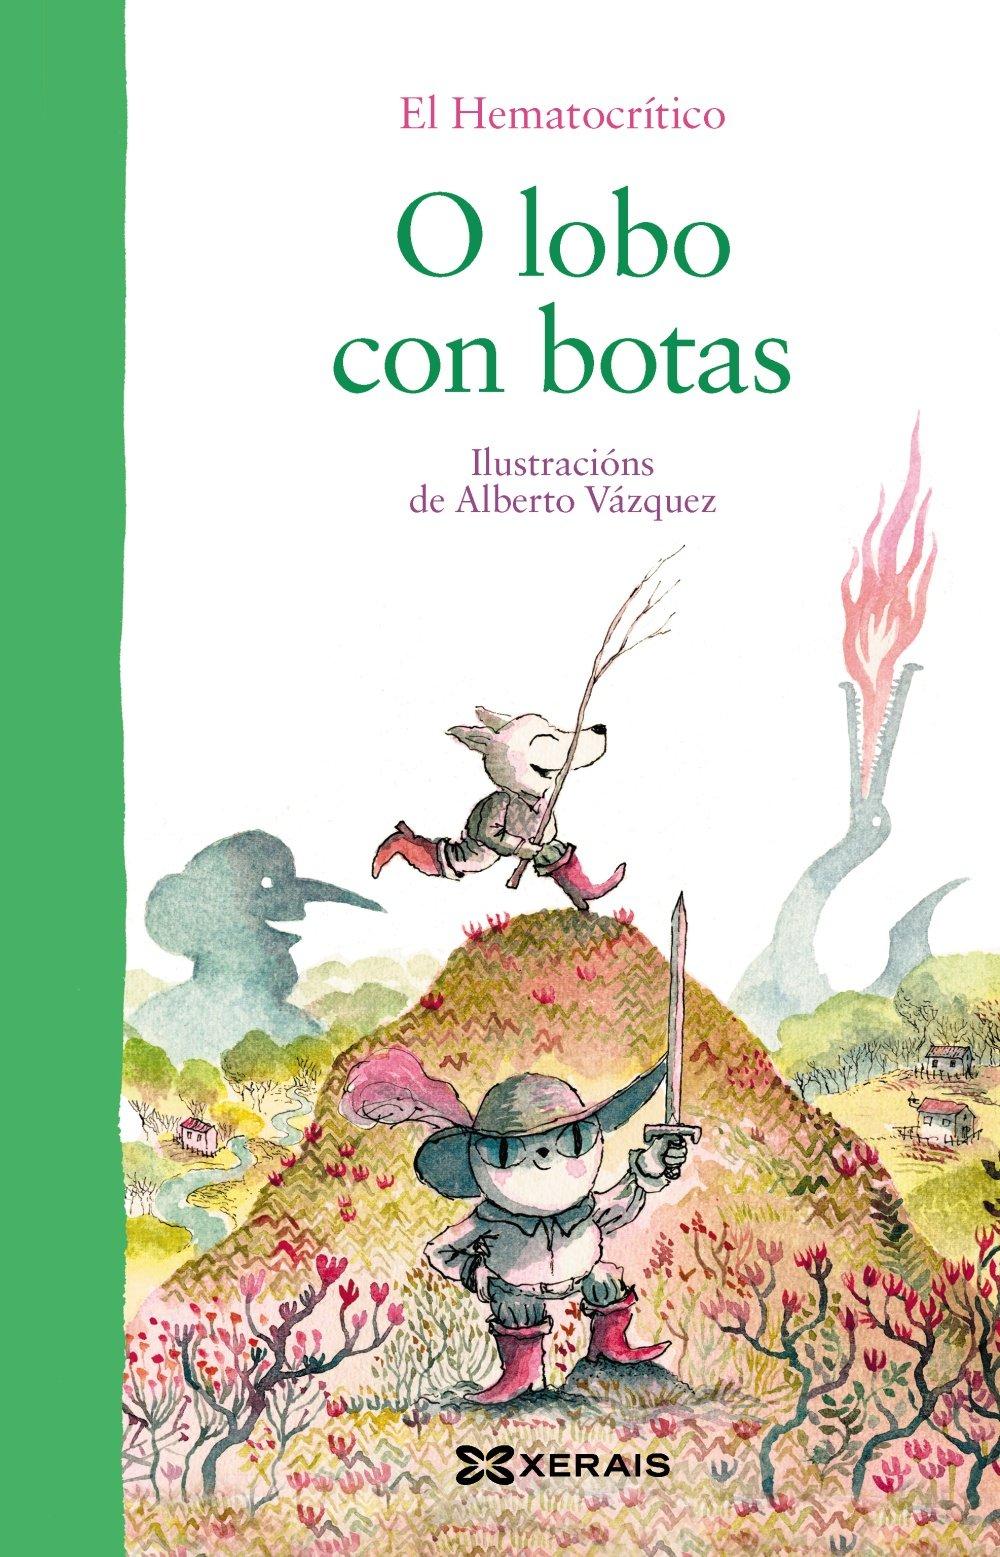 O lobo con botas Infantil E Xuvenil - Pequeno Merlín - Albums: Amazon.es: El Hematocrítico, Alberto Vázquez, Anaír Rodríguez Rodríguez: Libros